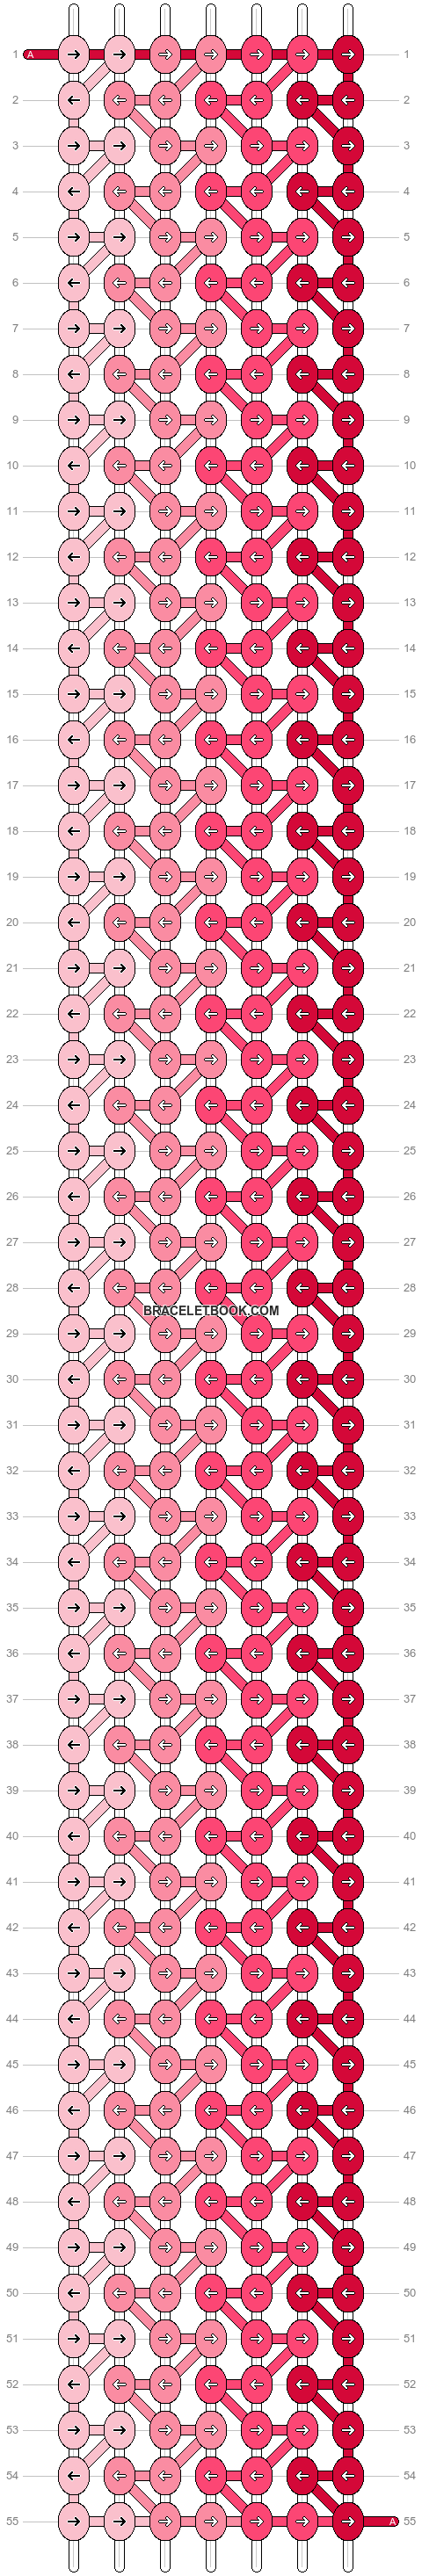 Alpha pattern #15230 pattern